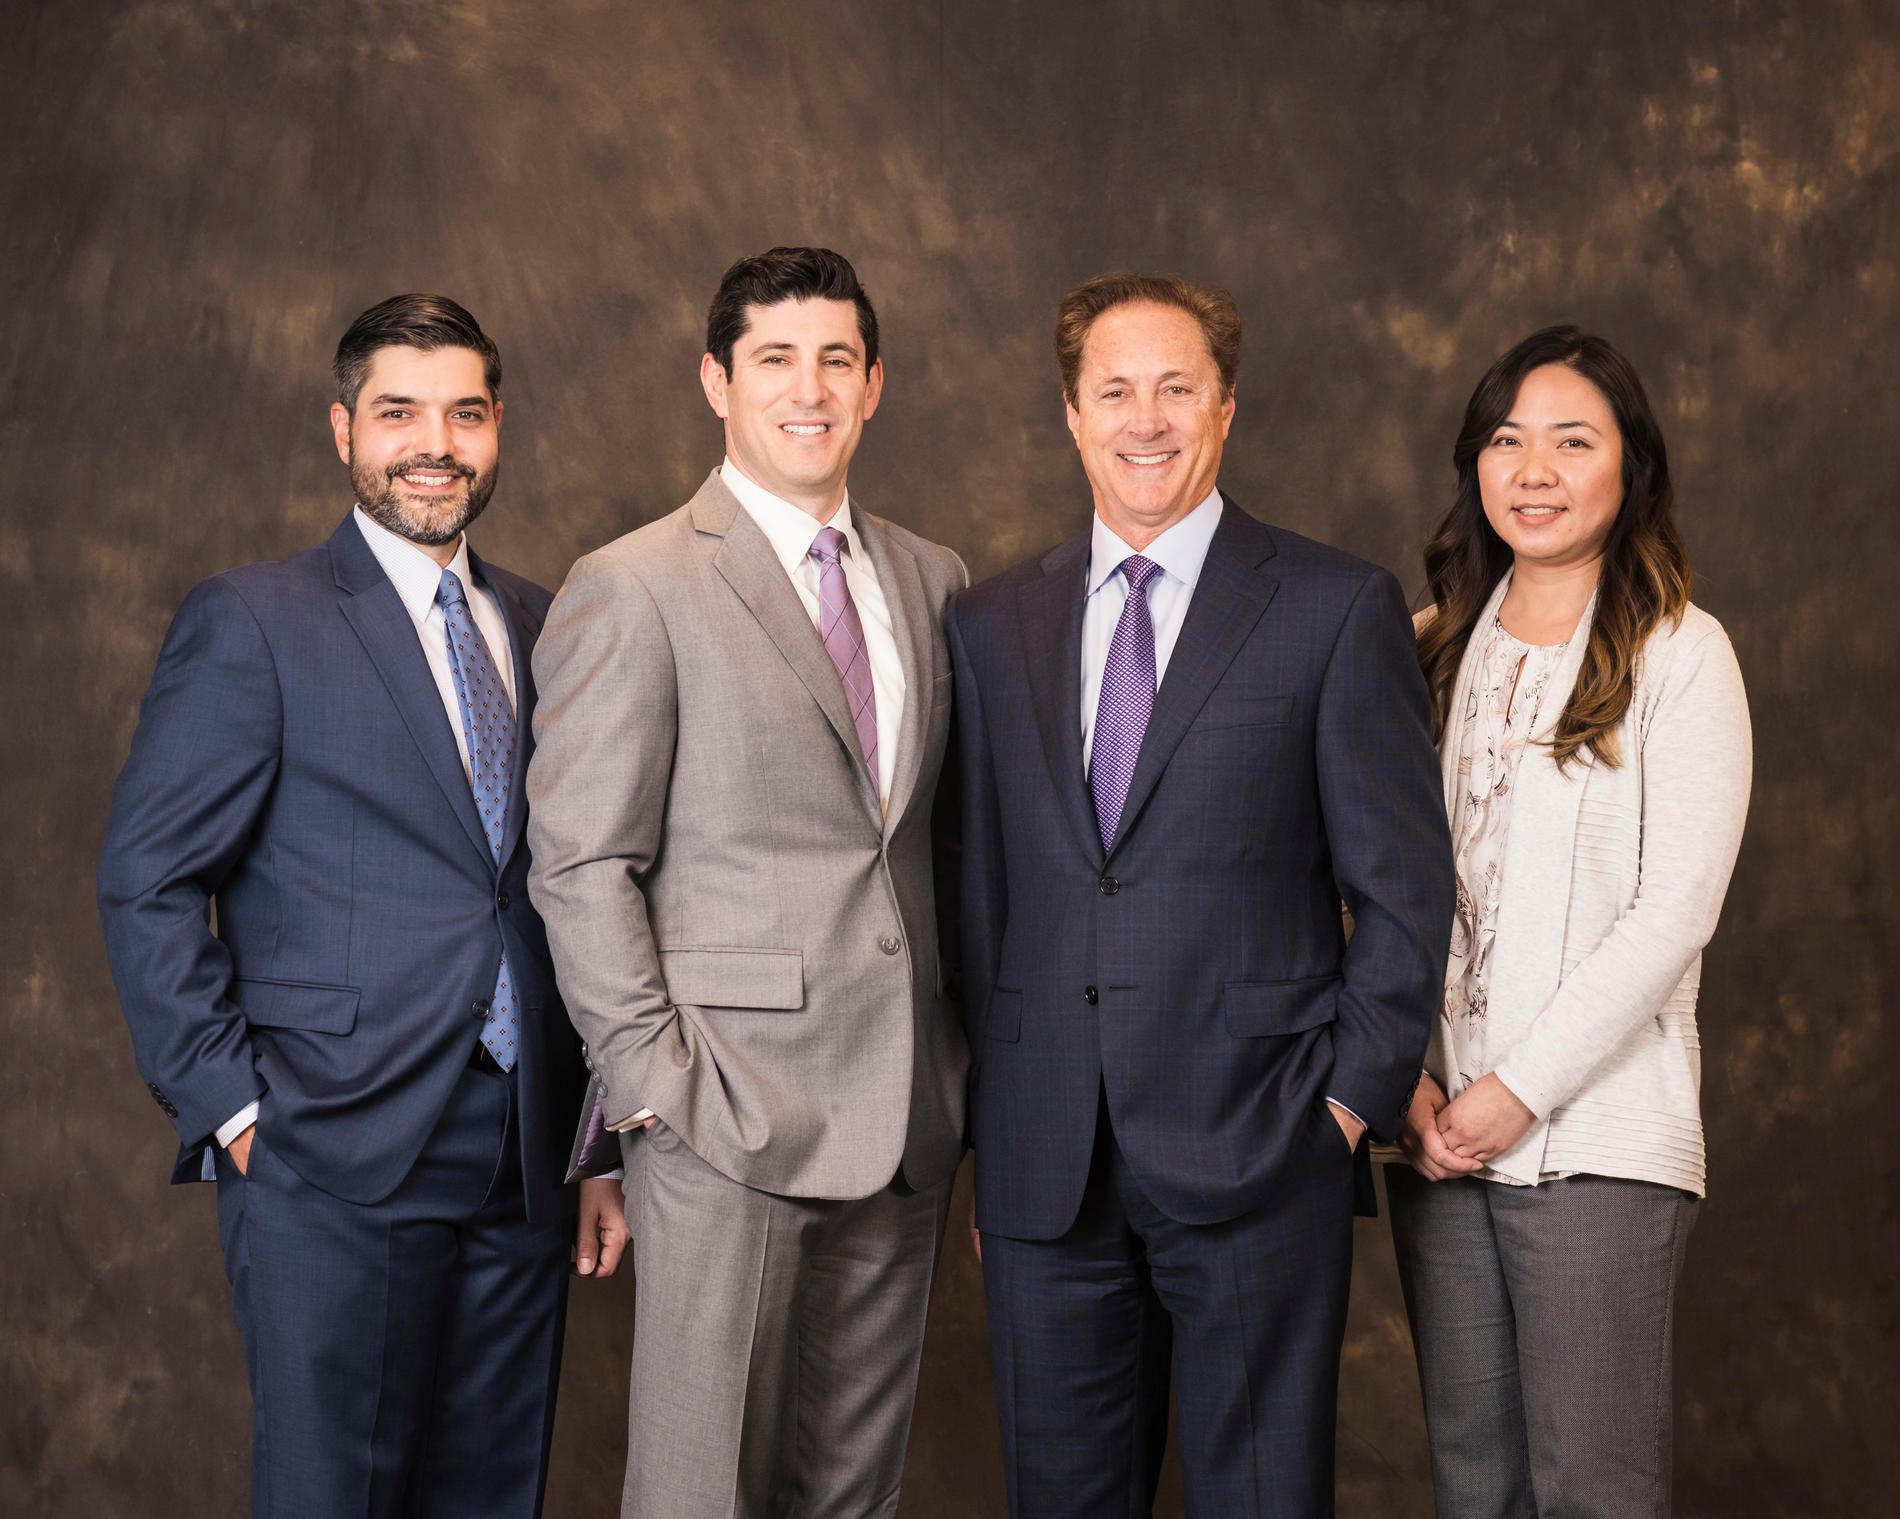 The Wingfield Group | Los Angeles, CA | Morgan Stanley